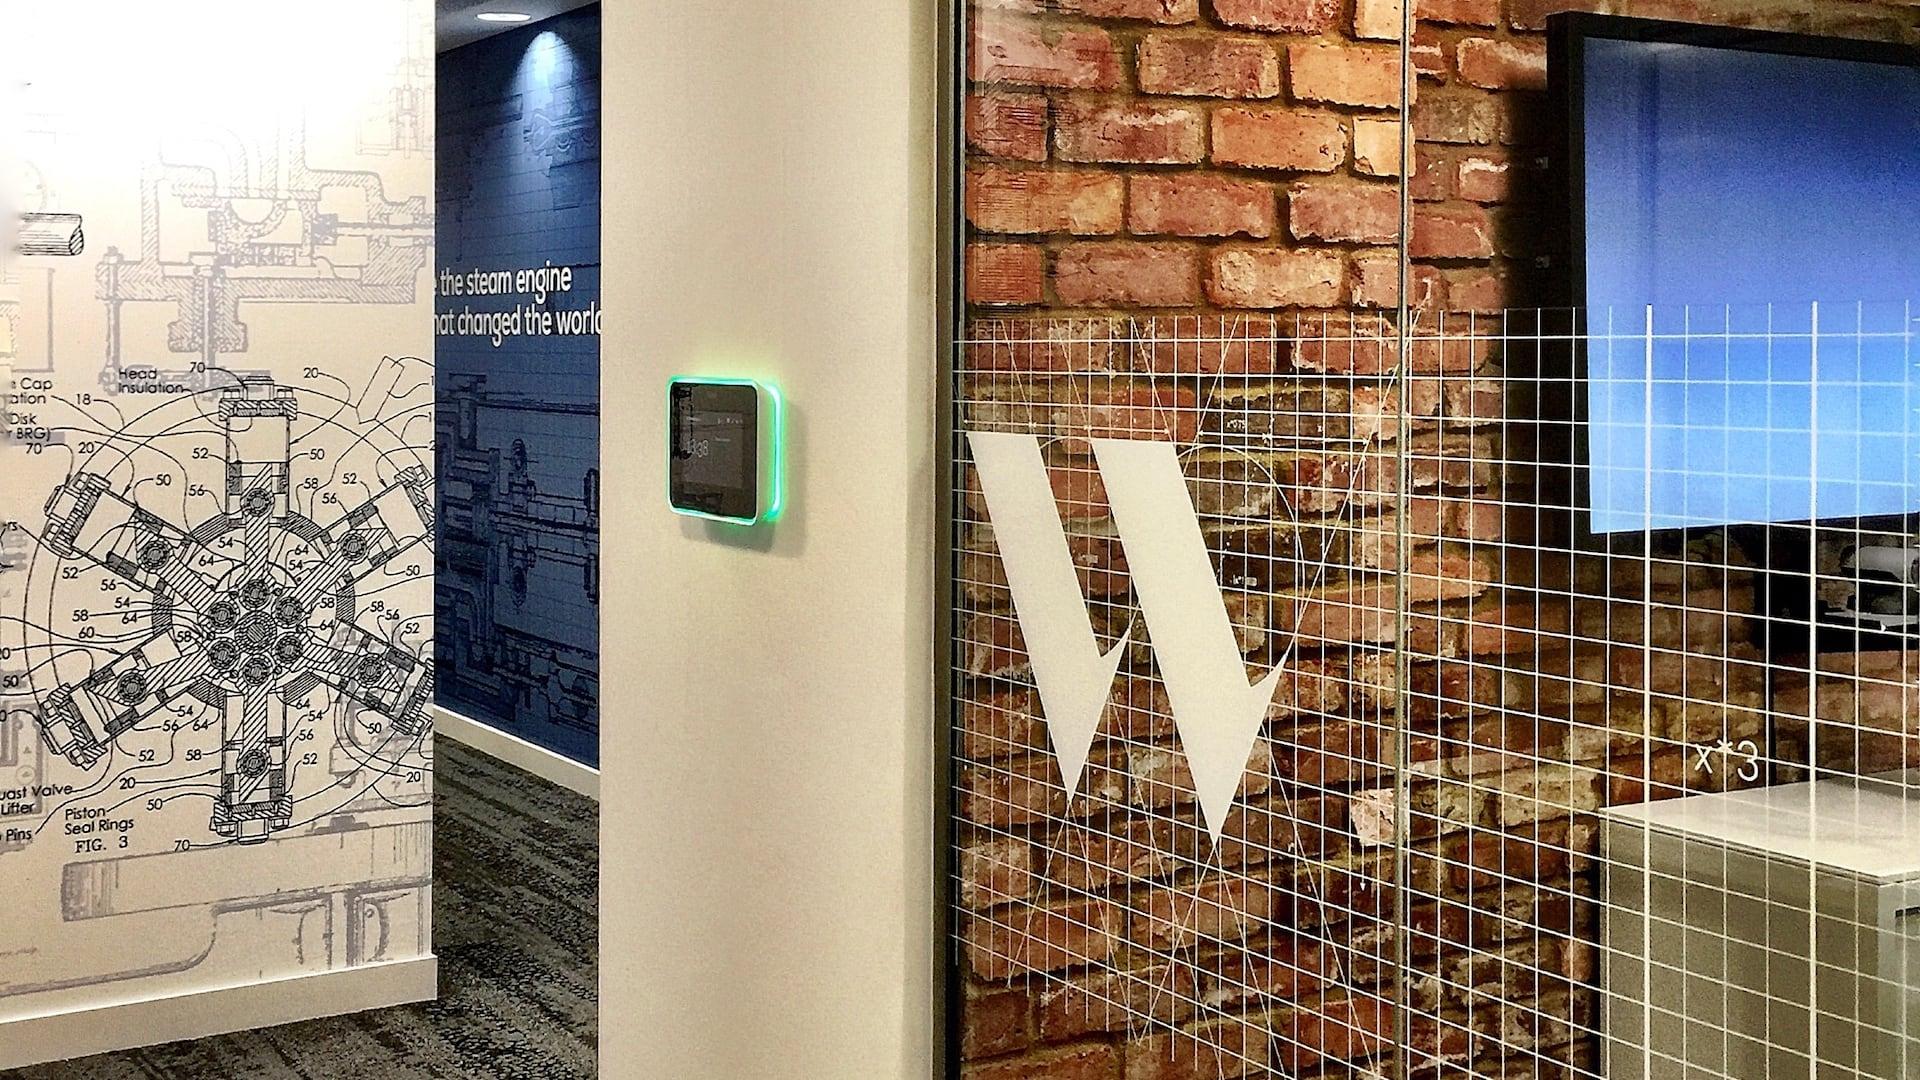 London Office Design Awards